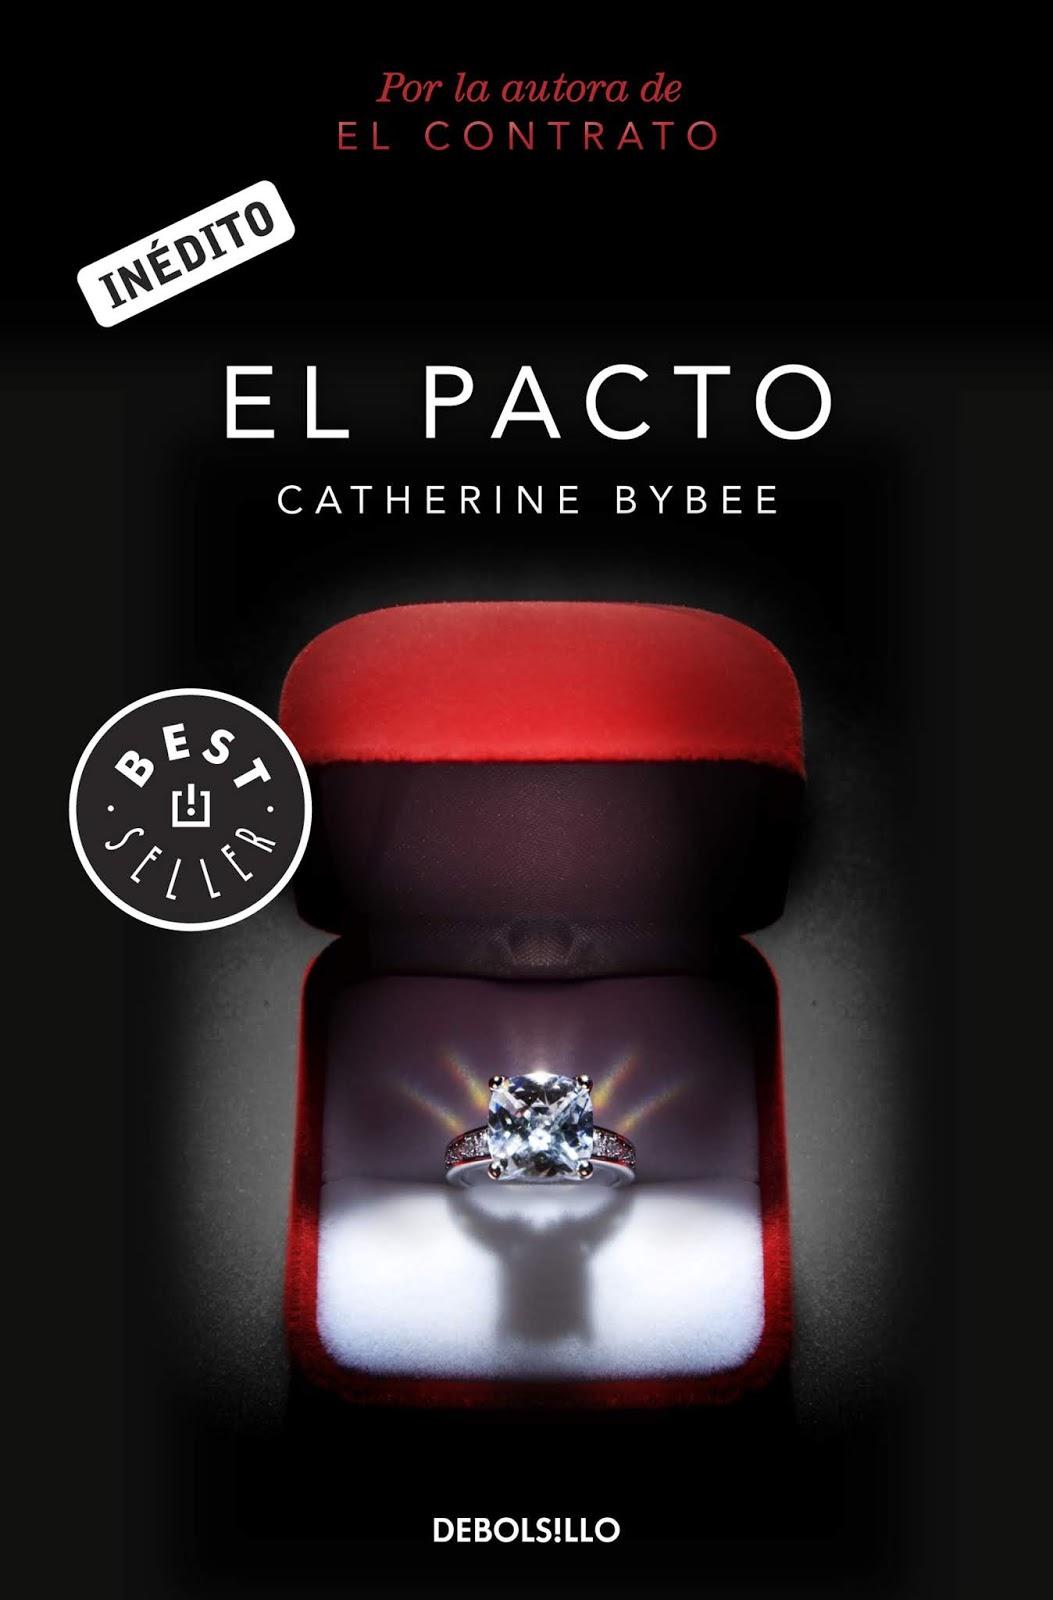 El Pacto de Catherine Bybee